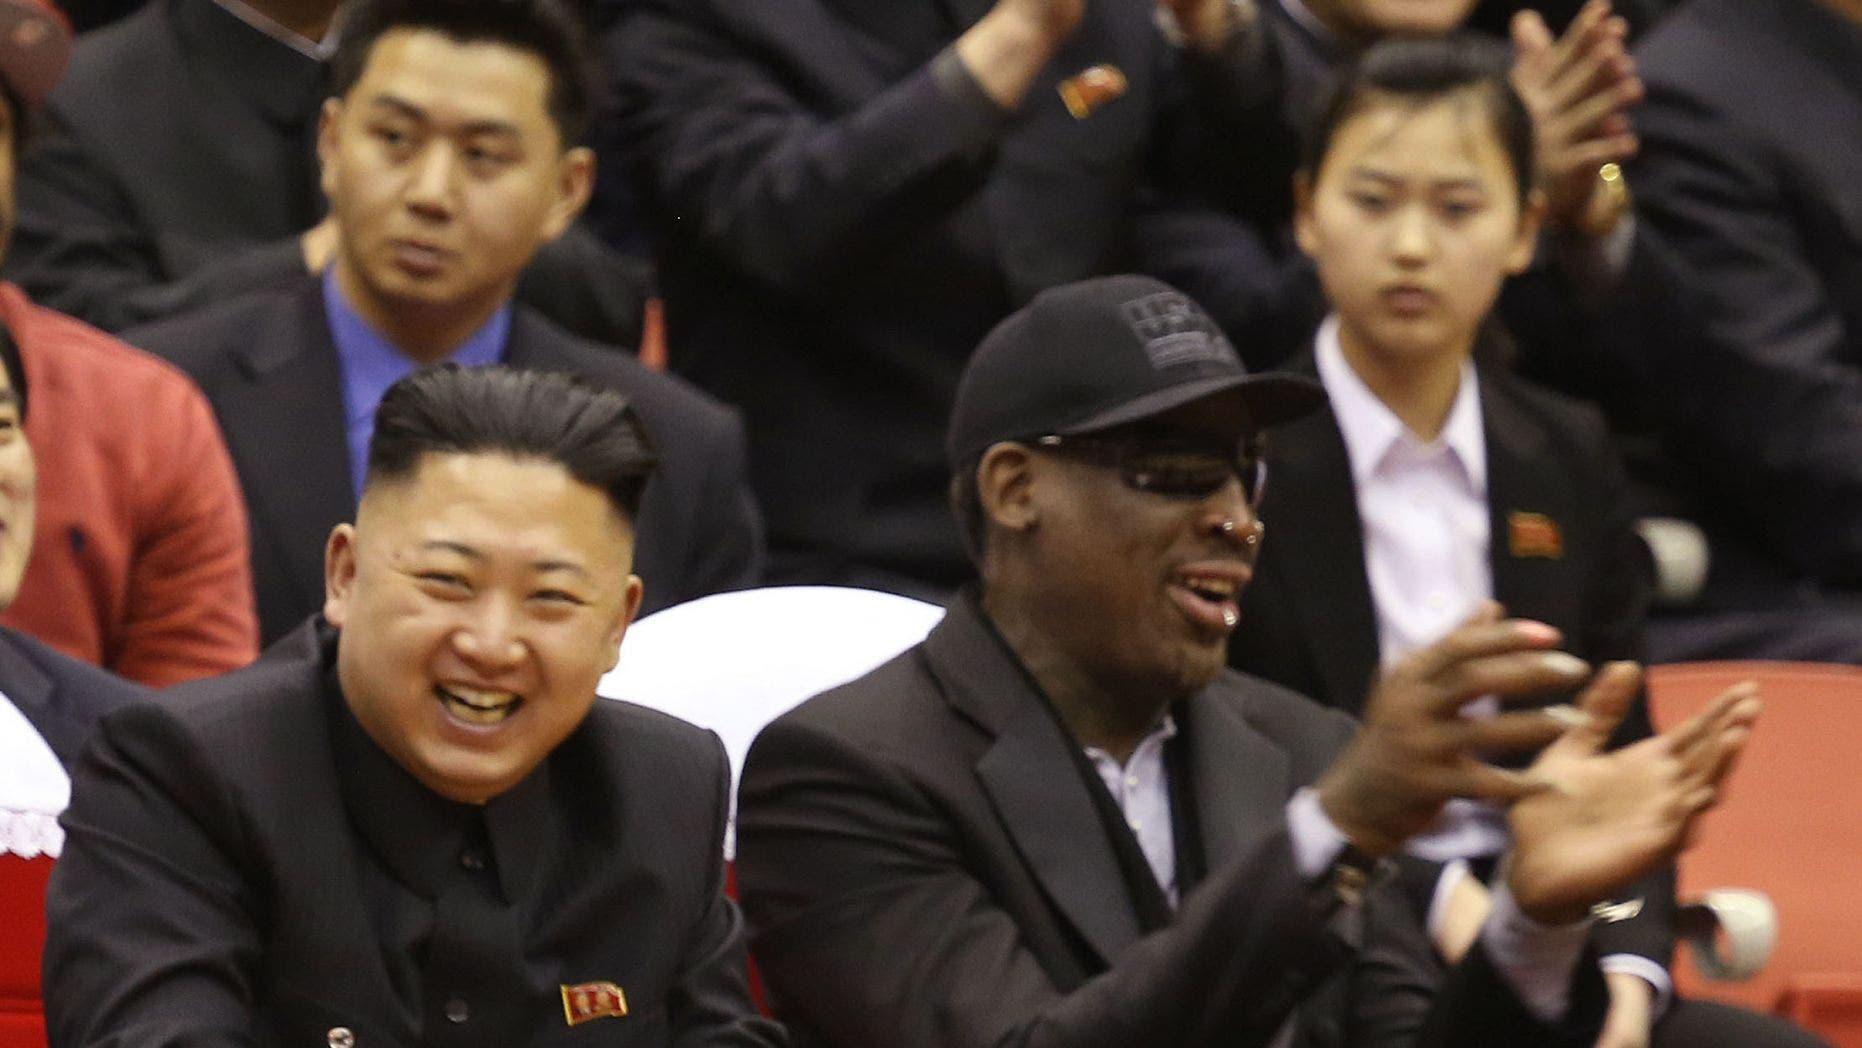 Dennis Rodman makes bold prediction about Kim Jong Un on 'Fox & Friends'